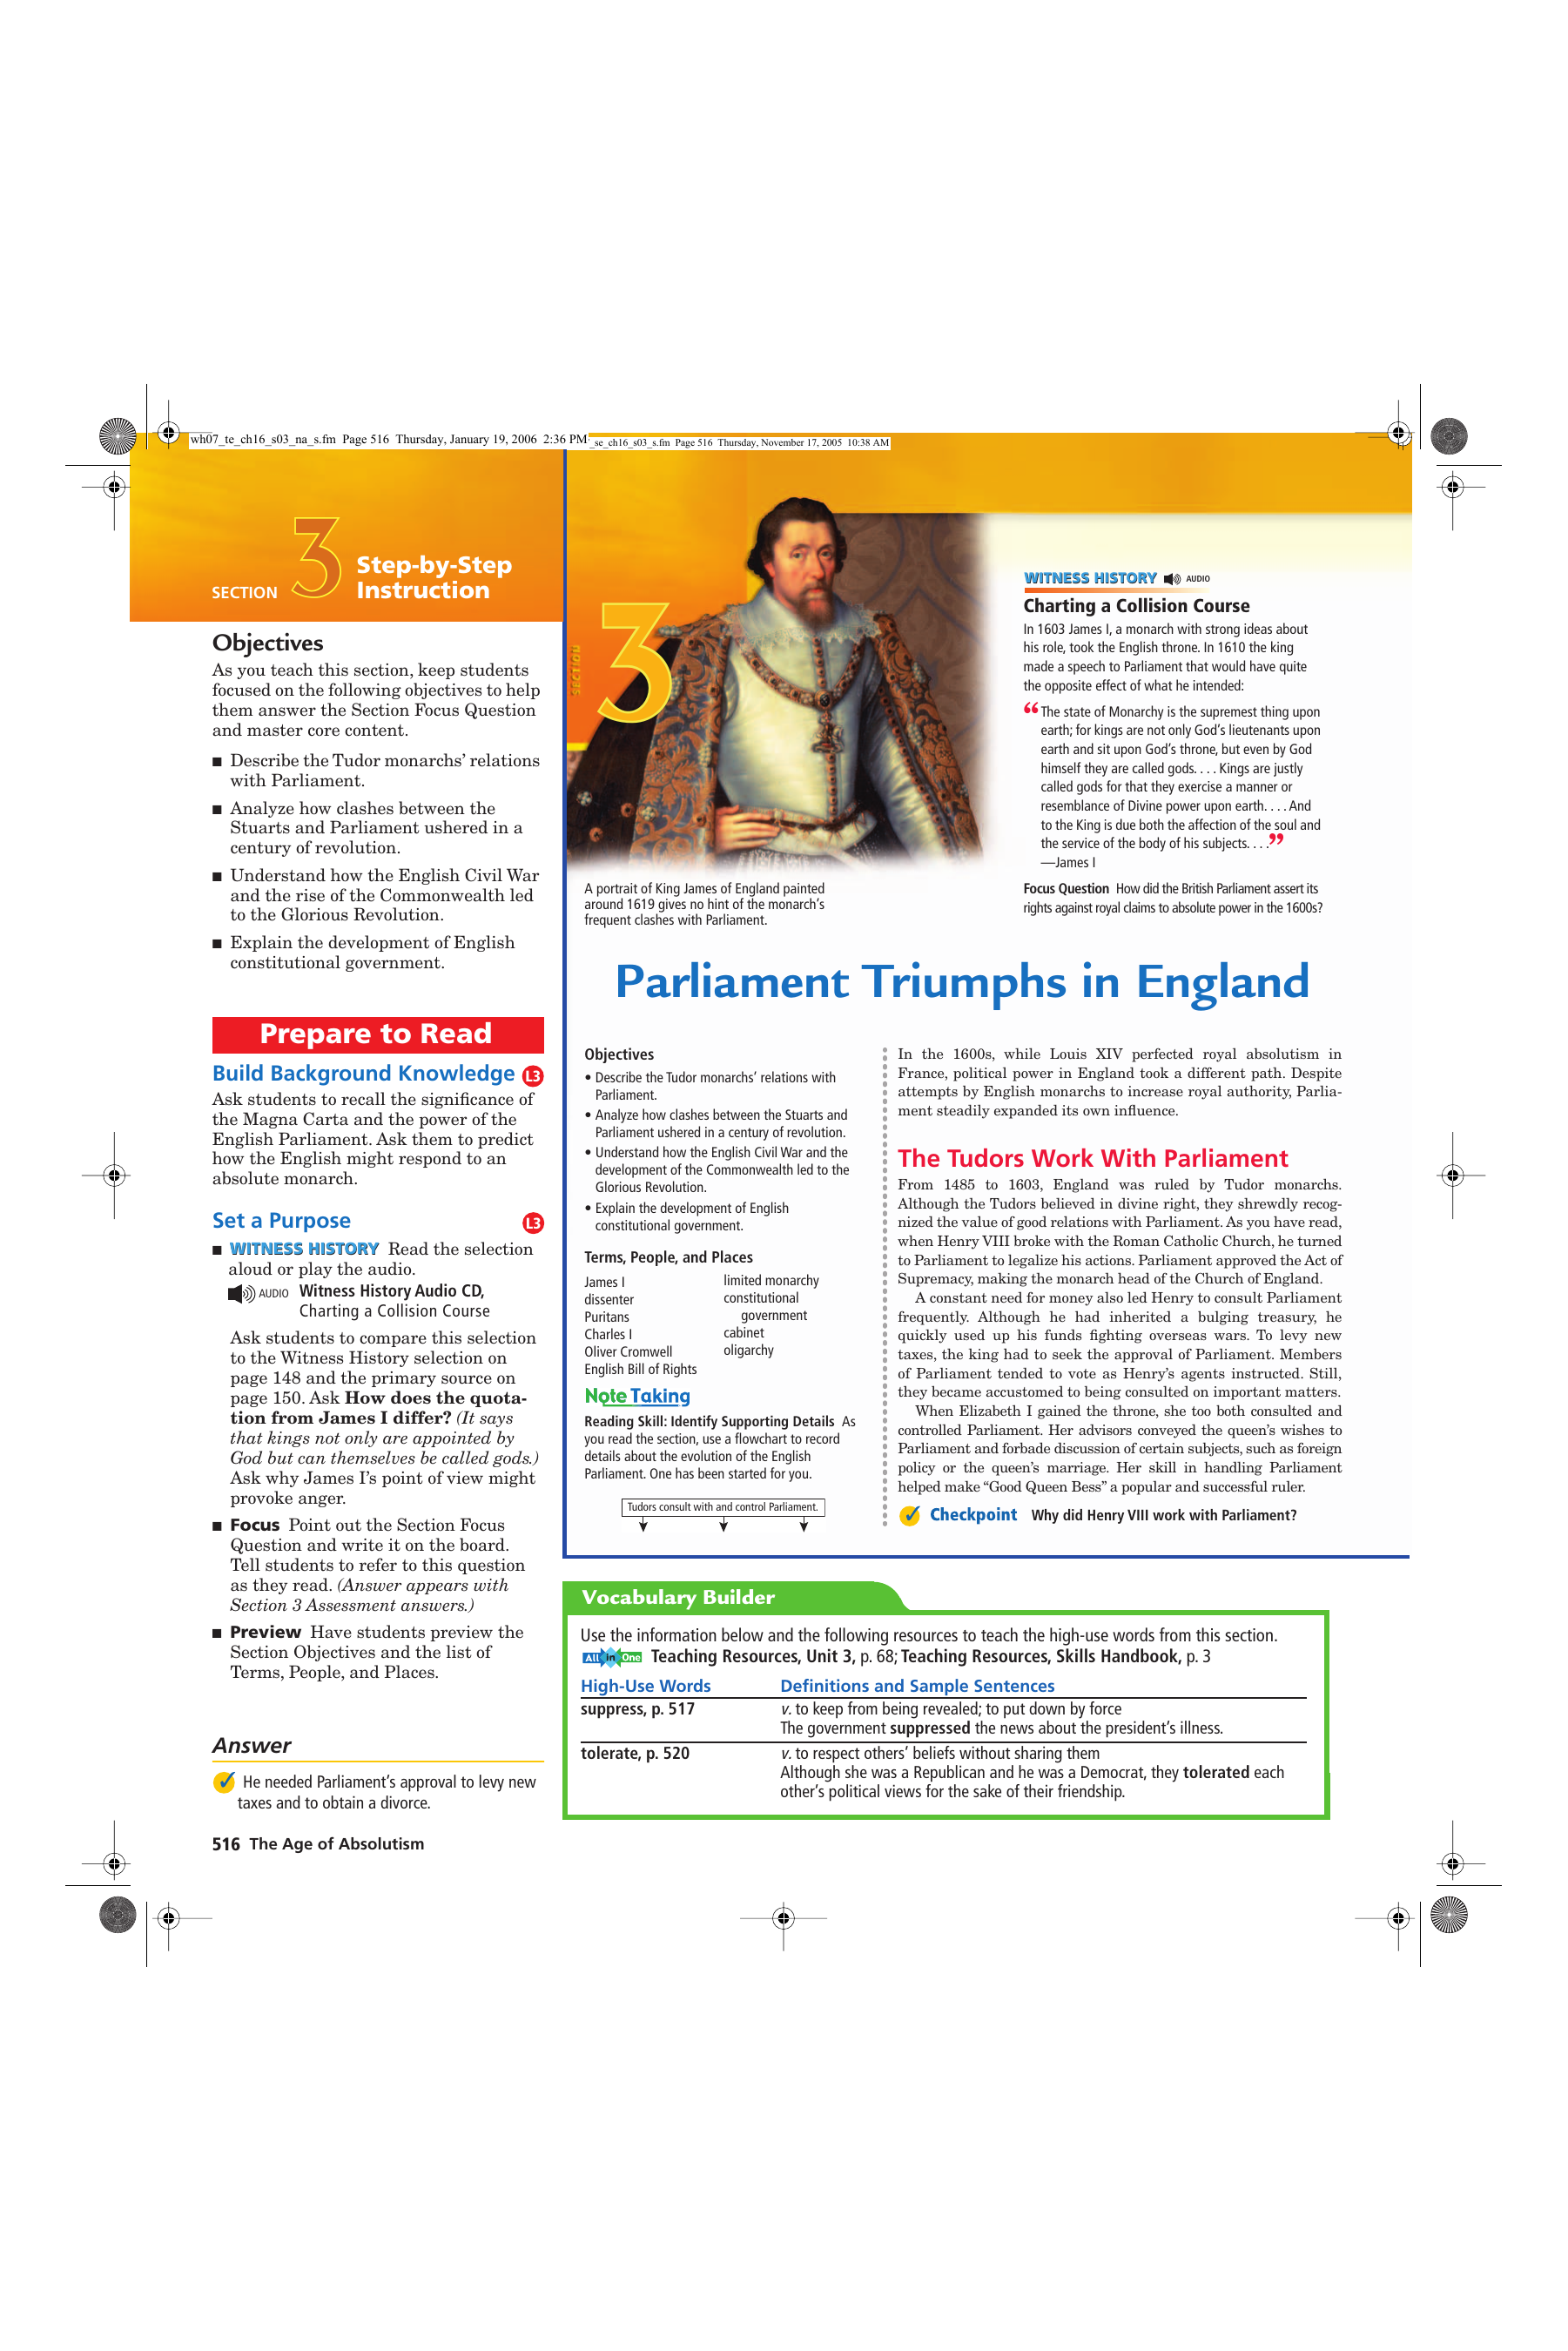 Parliament Triumphs In England